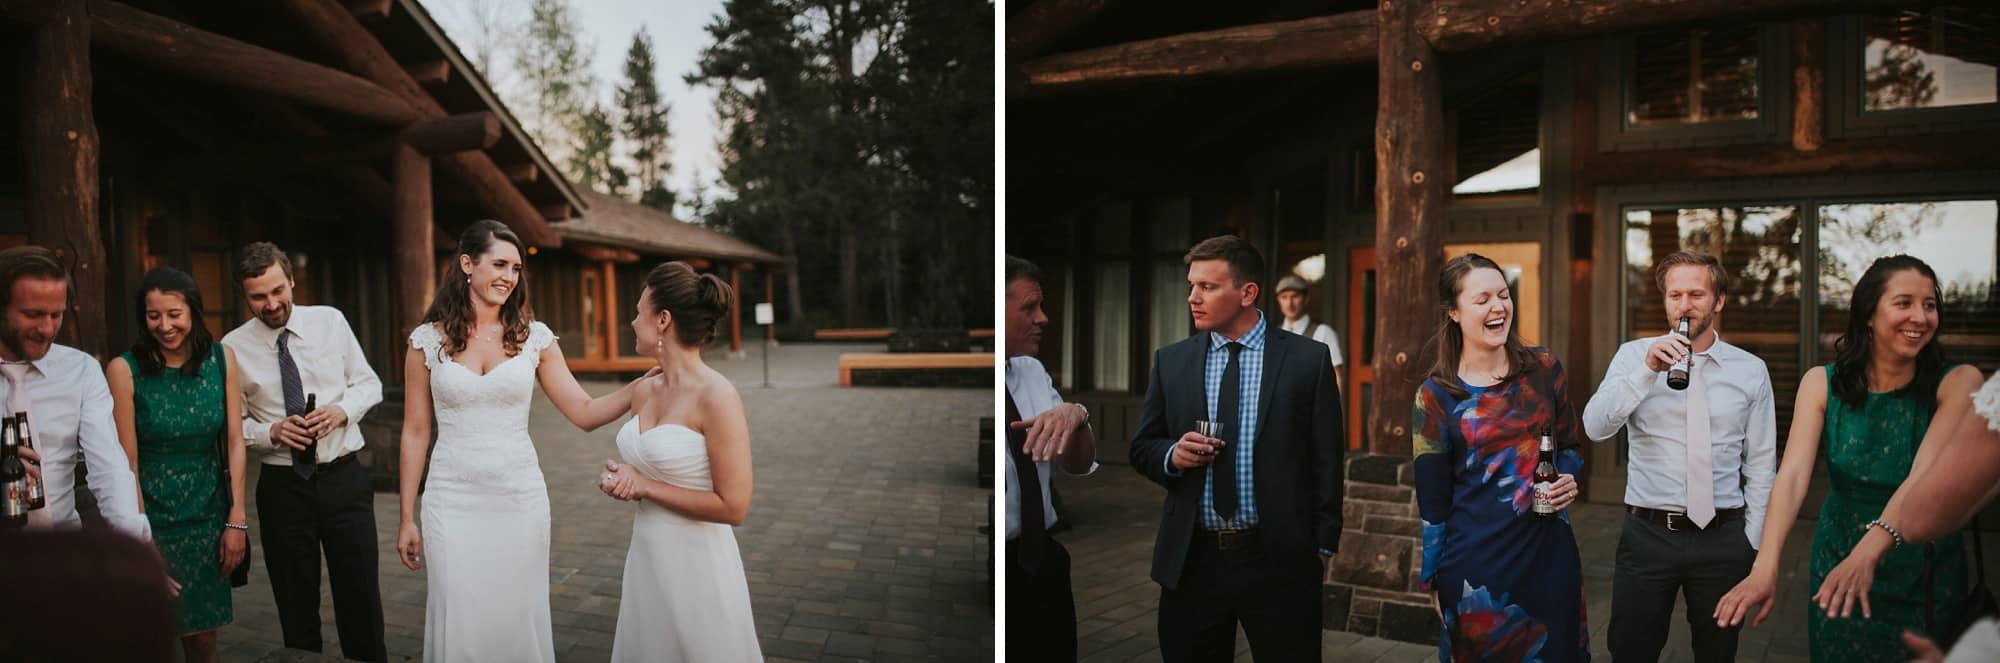 Sara Emily Sunriver Bend Oregon Rustic Lodge Wedding 0066